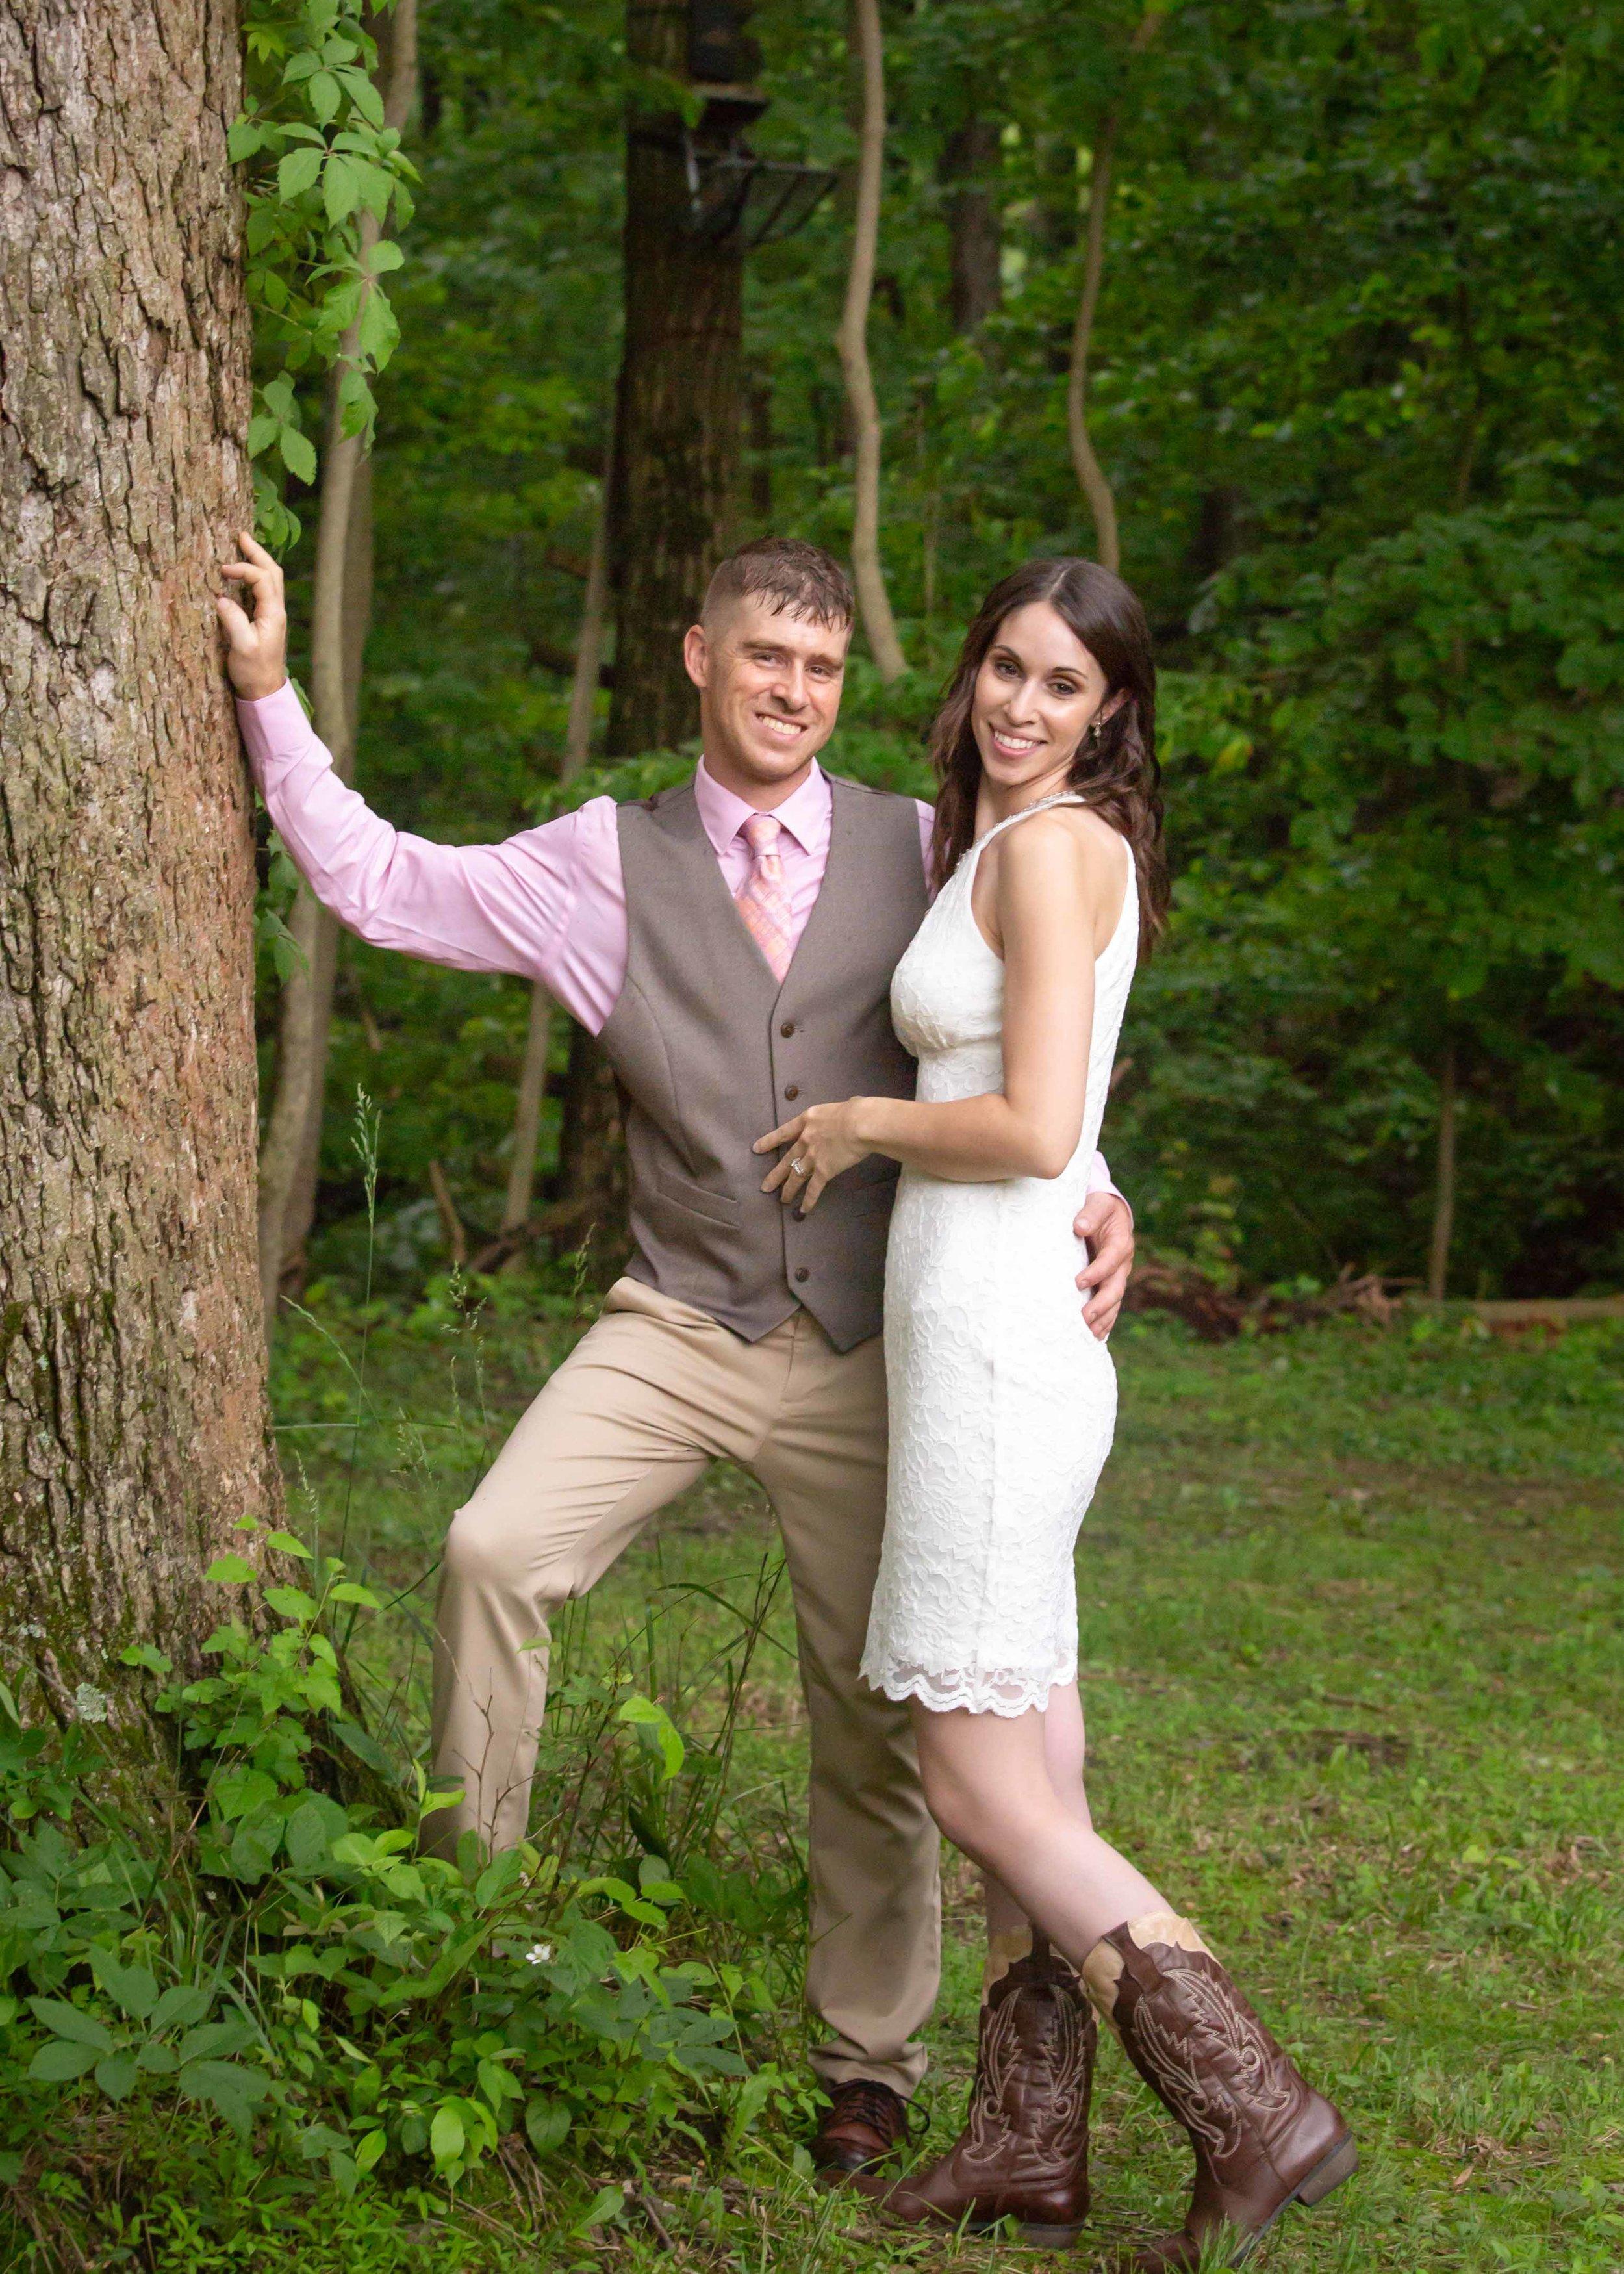 Vow Renewal, Wedding Photography-23.jpg